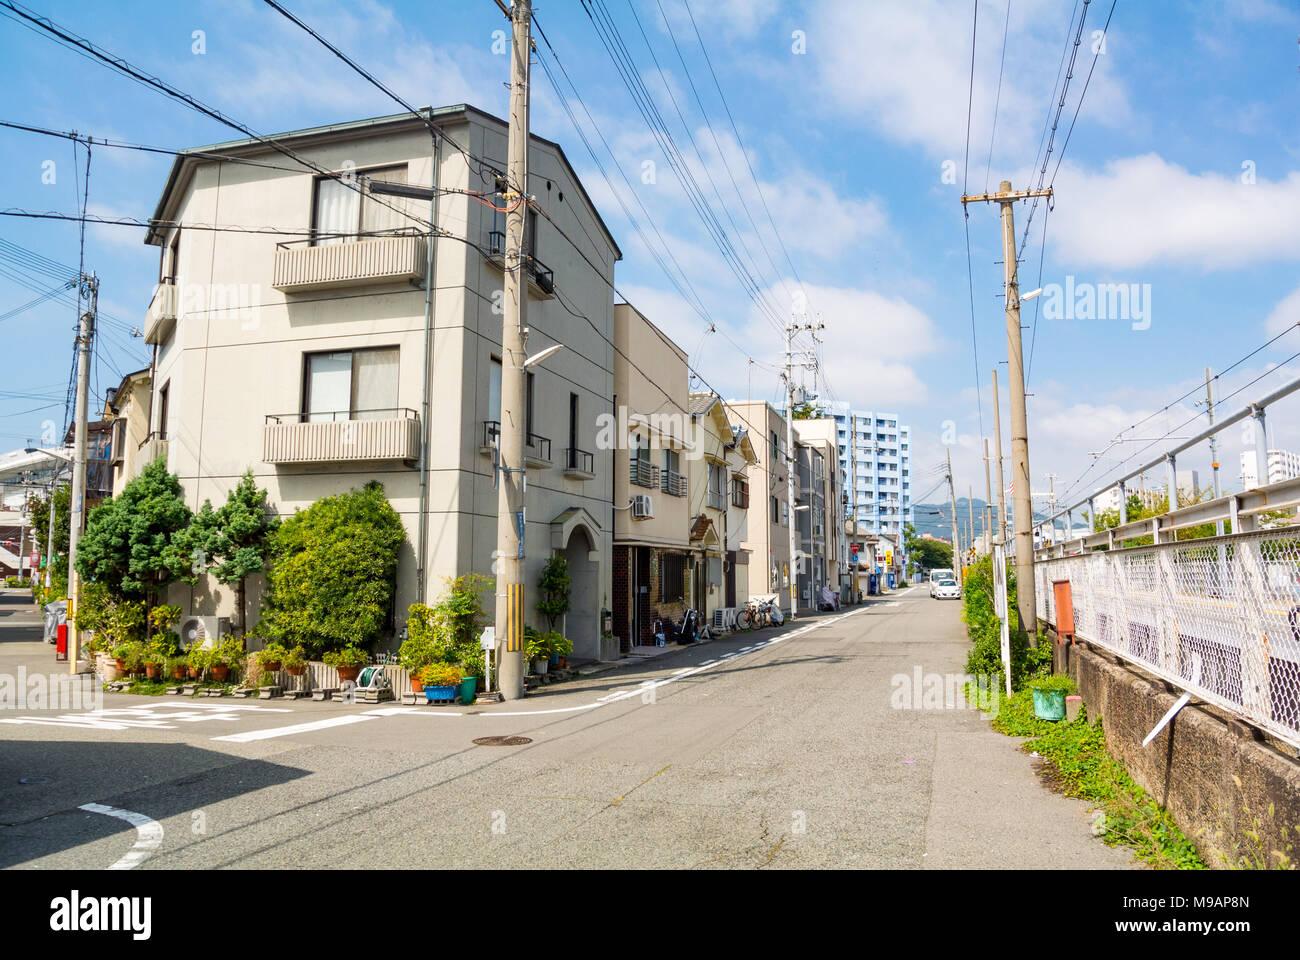 Street scene kobe hyogo prefecture japan stock photo 177872597 street scene kobe hyogo prefecture japan publicscrutiny Images